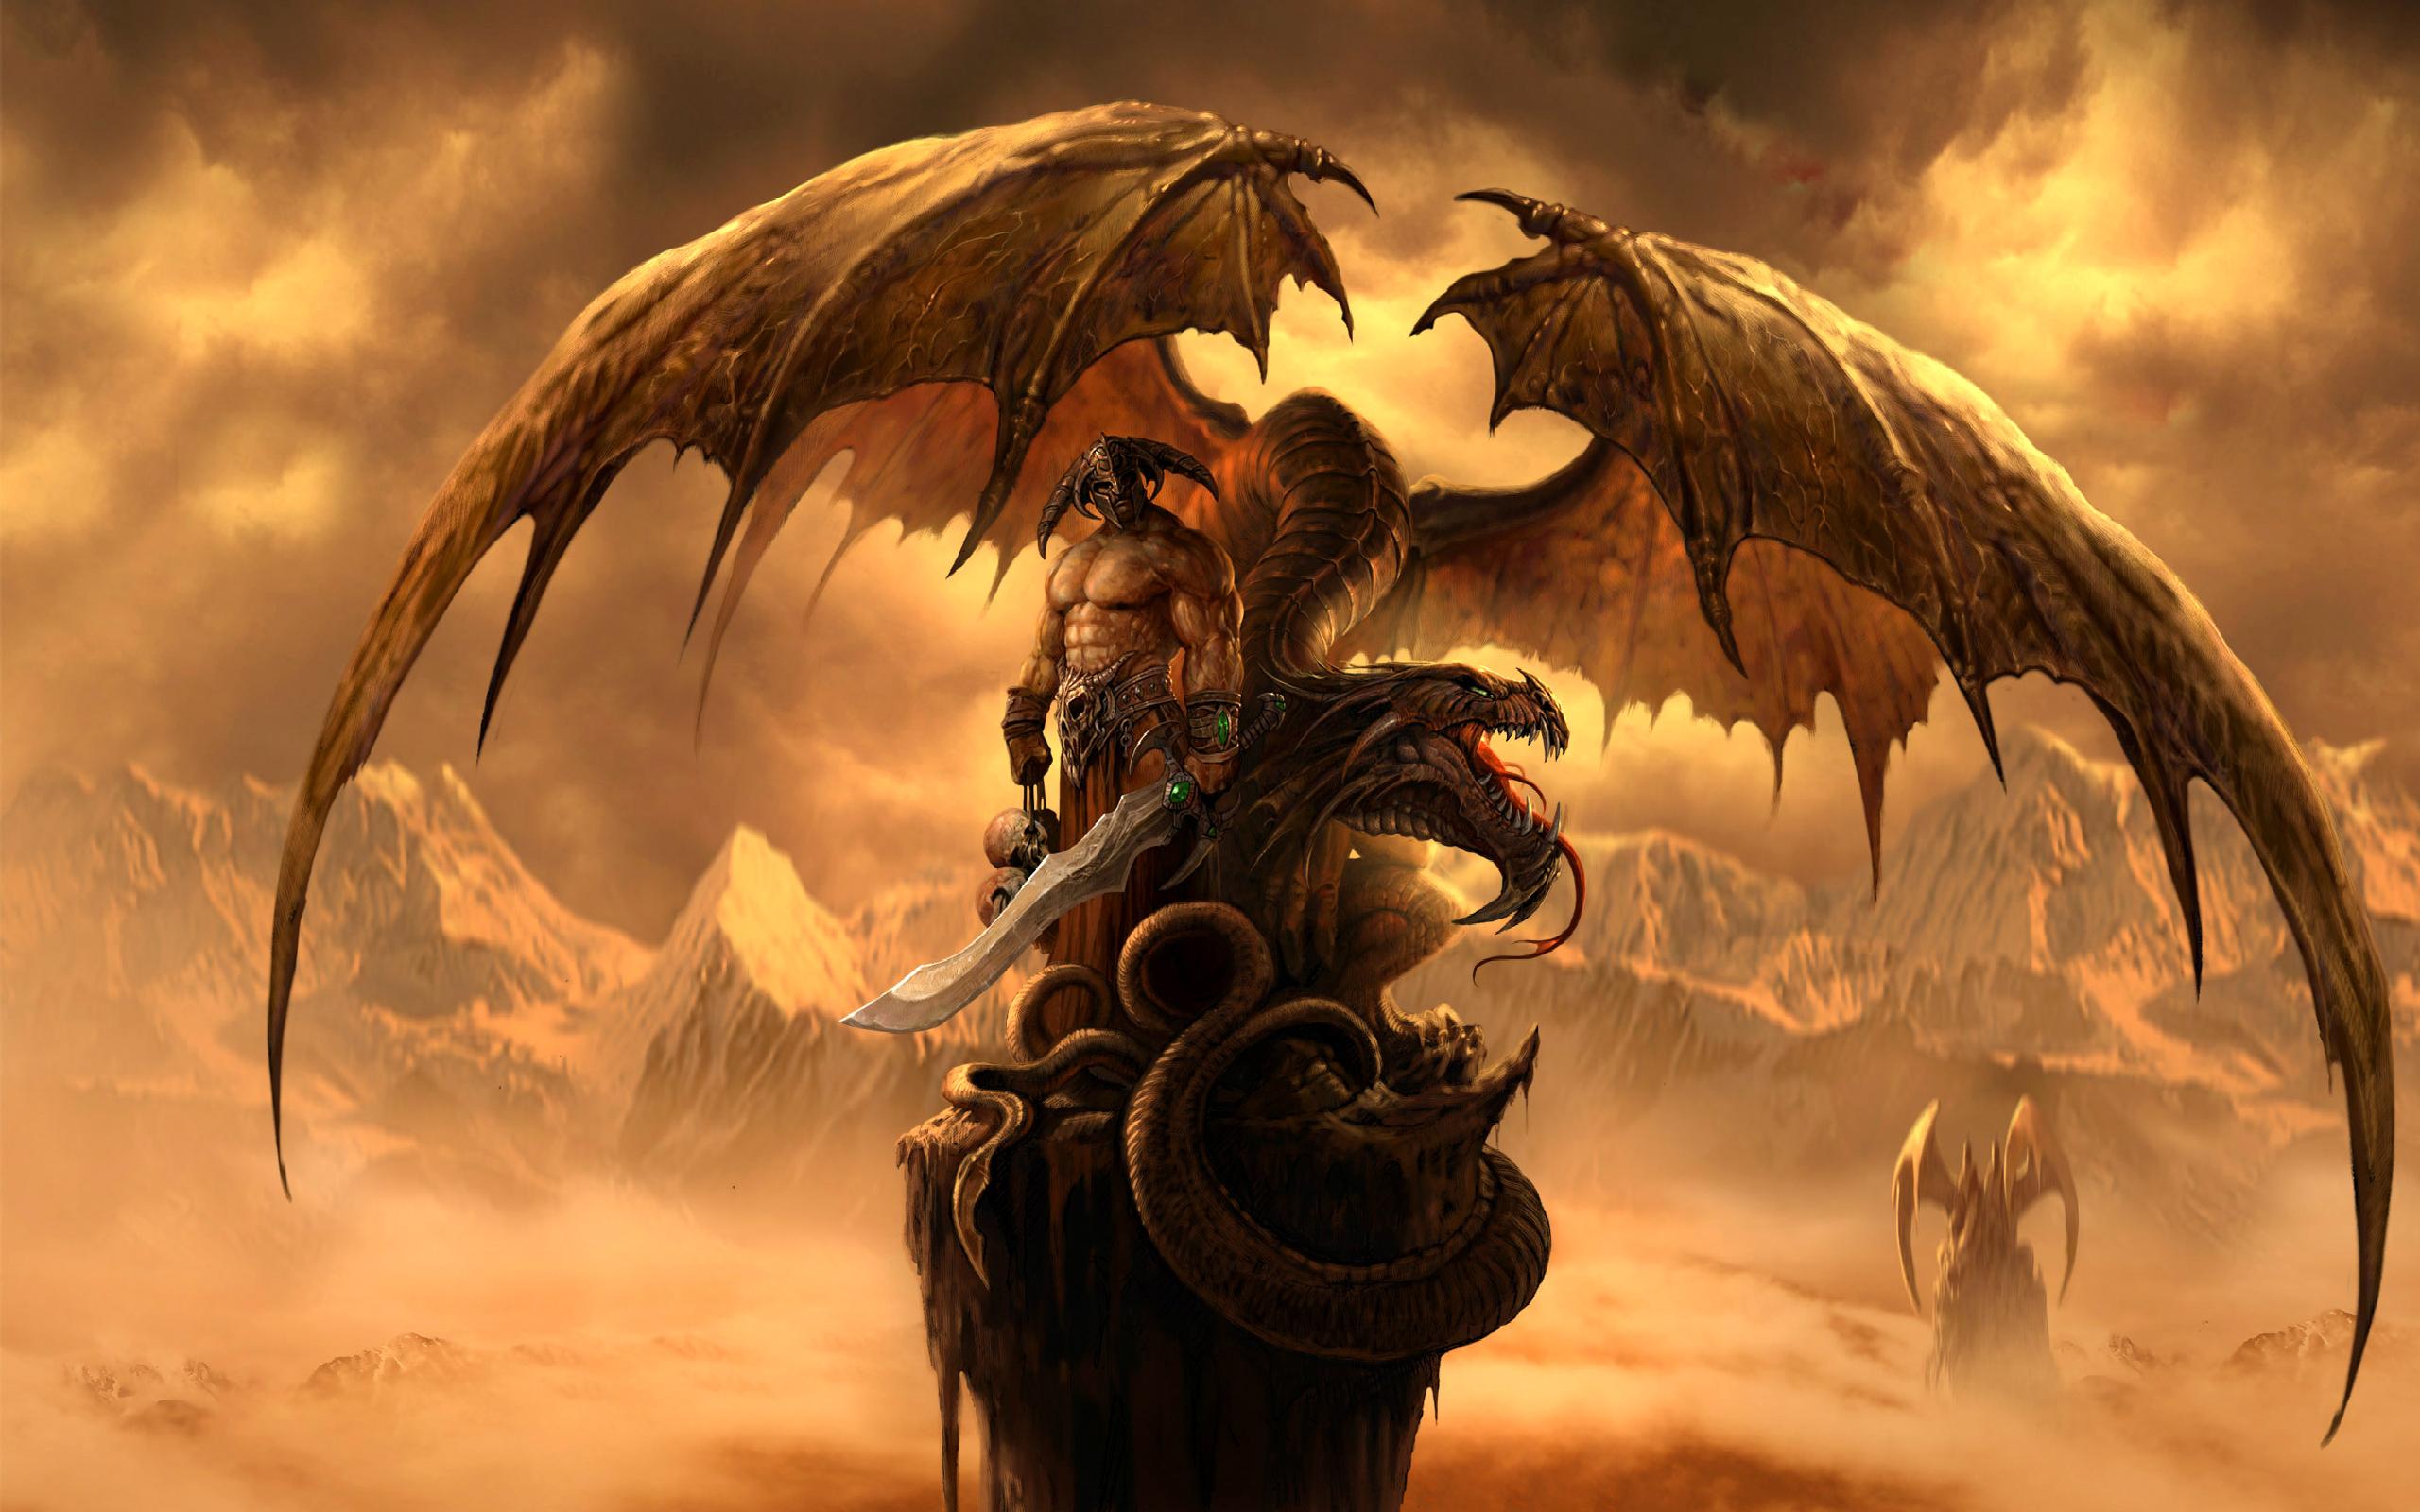 Fantasy Dragon Exclusive HD Wallpapers 4272 2560x1600